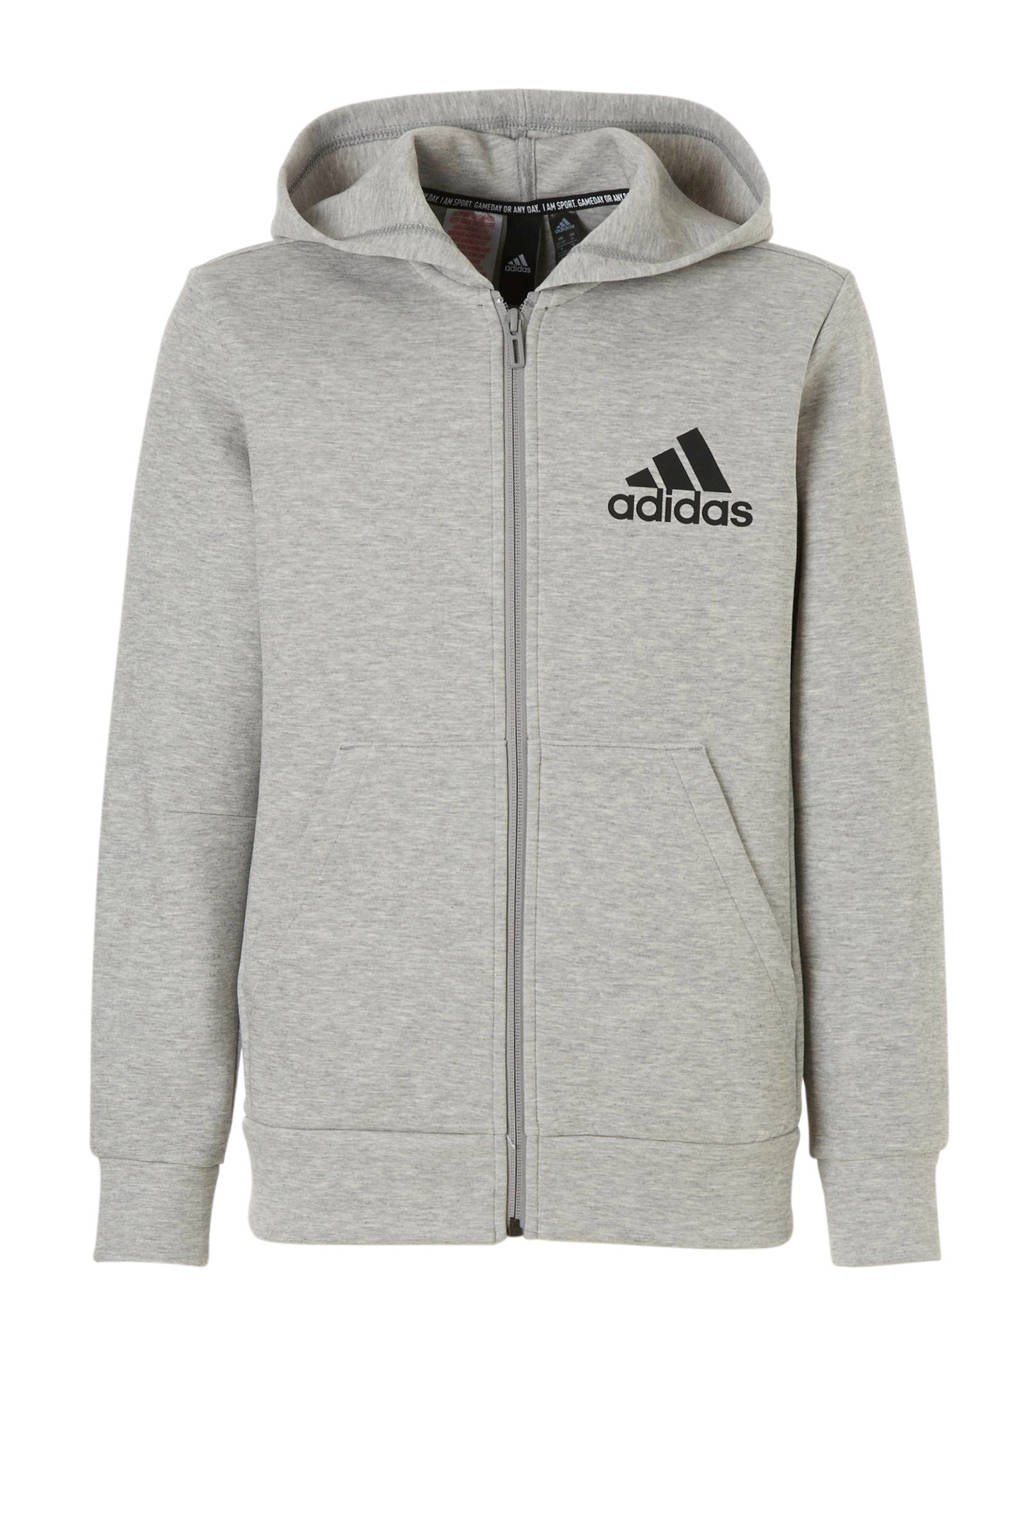 adidas performance   sportvest grijs melange, Grijs/zwart